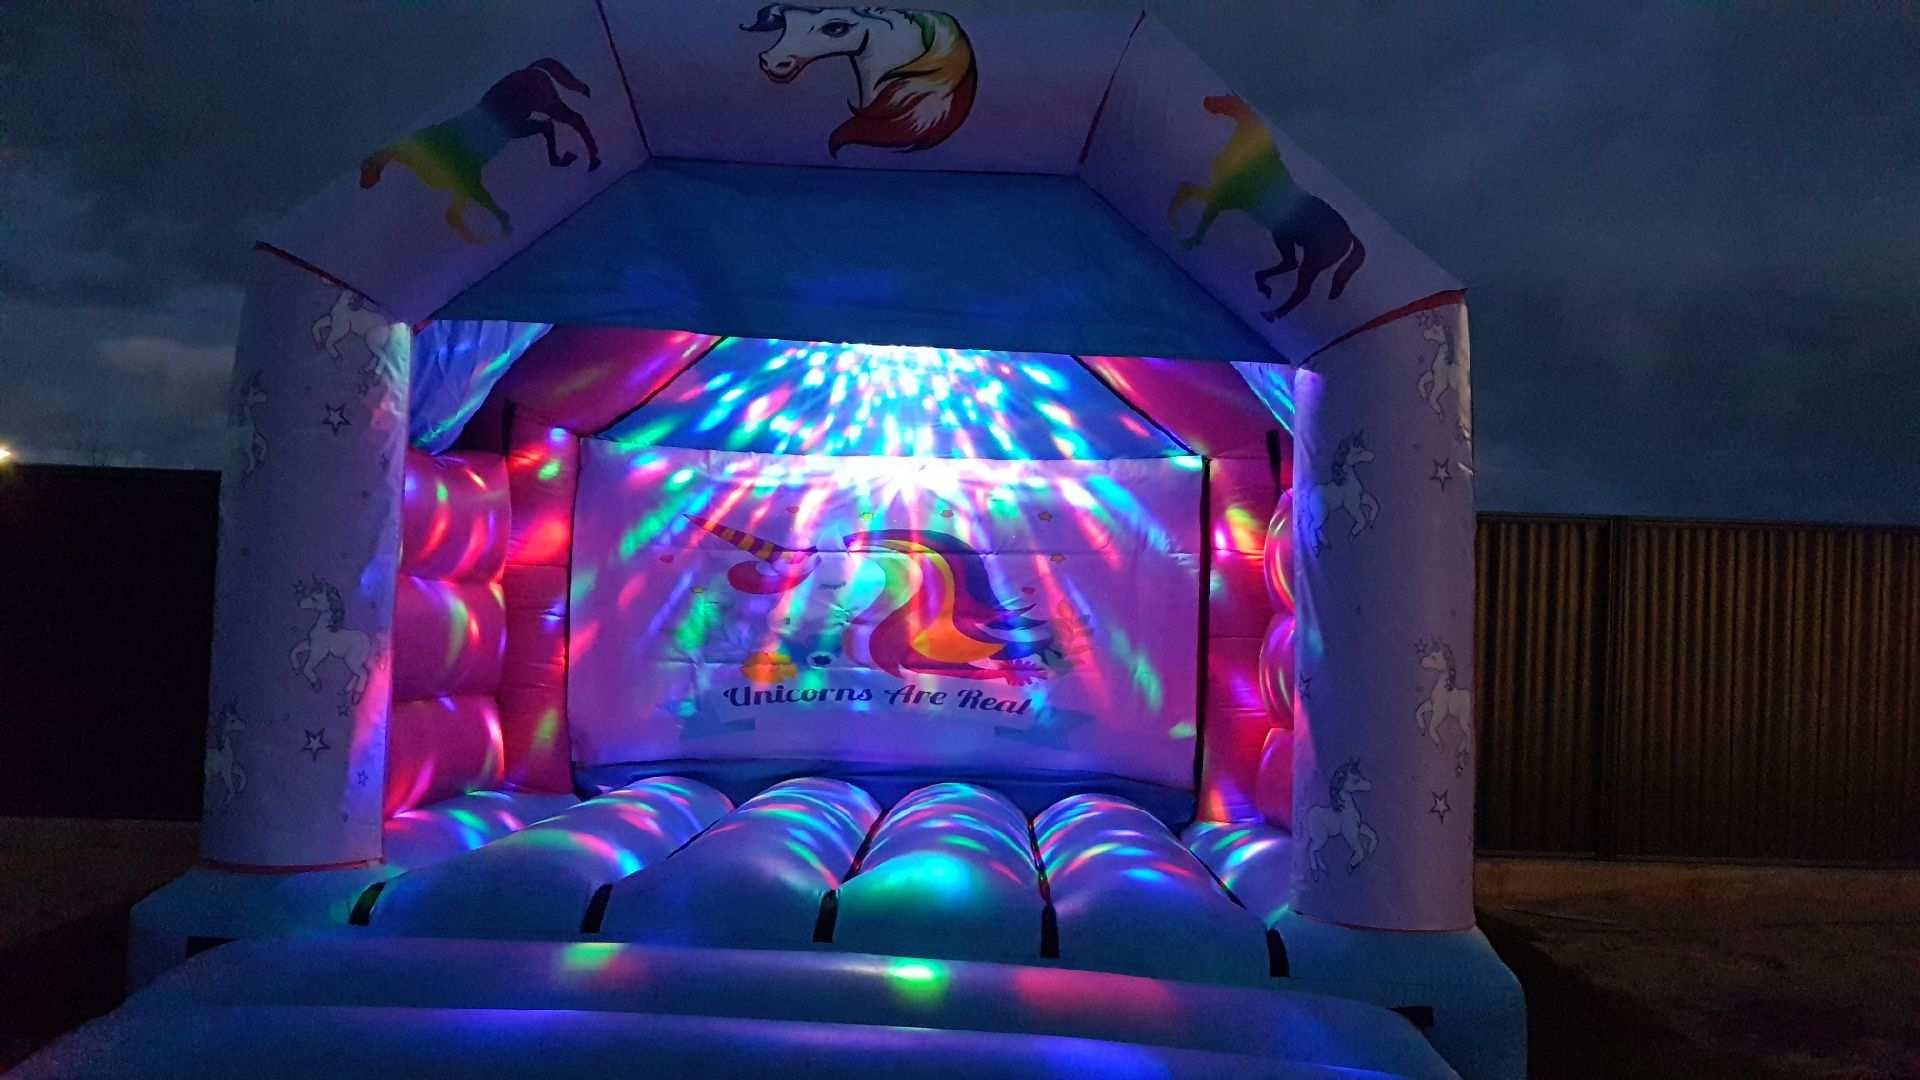 disco bouncy castle hire rockingham.6168,WA